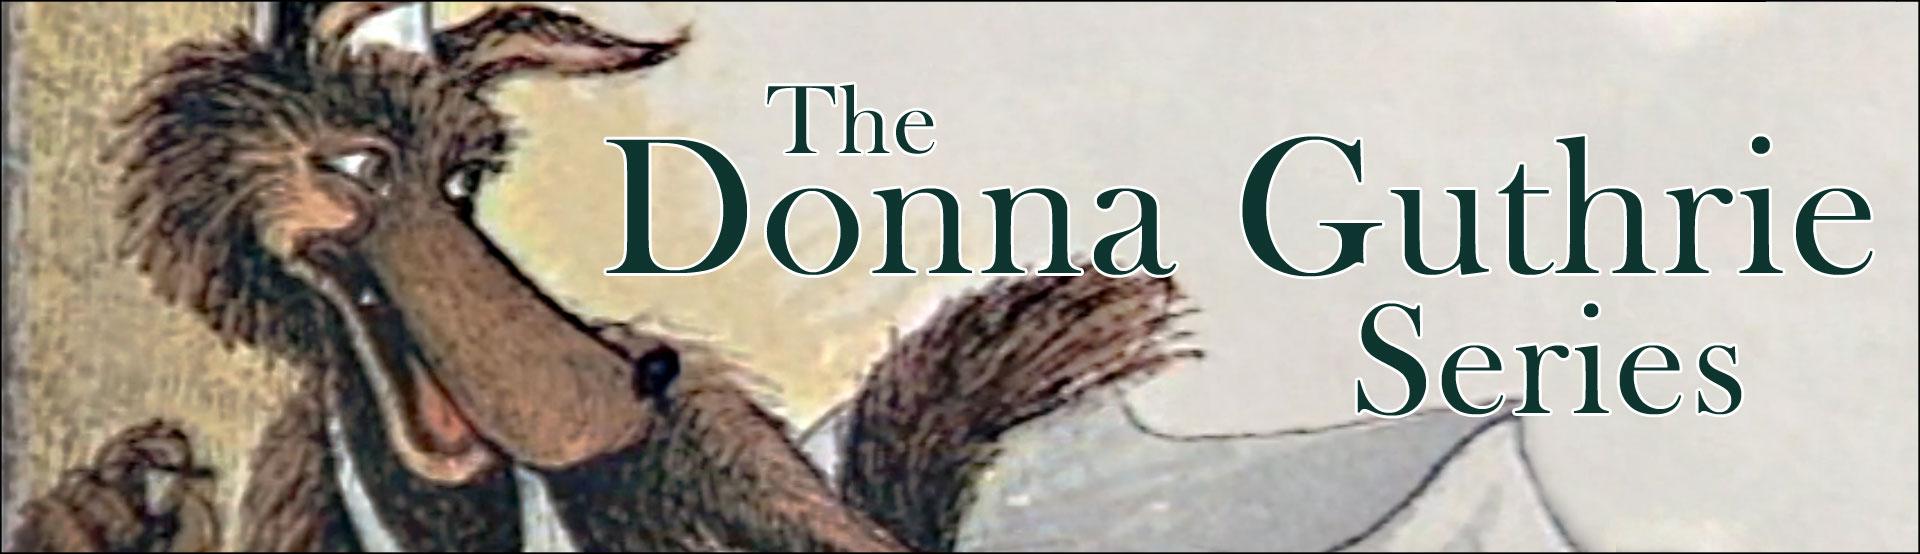 The Donna Guthrie Series